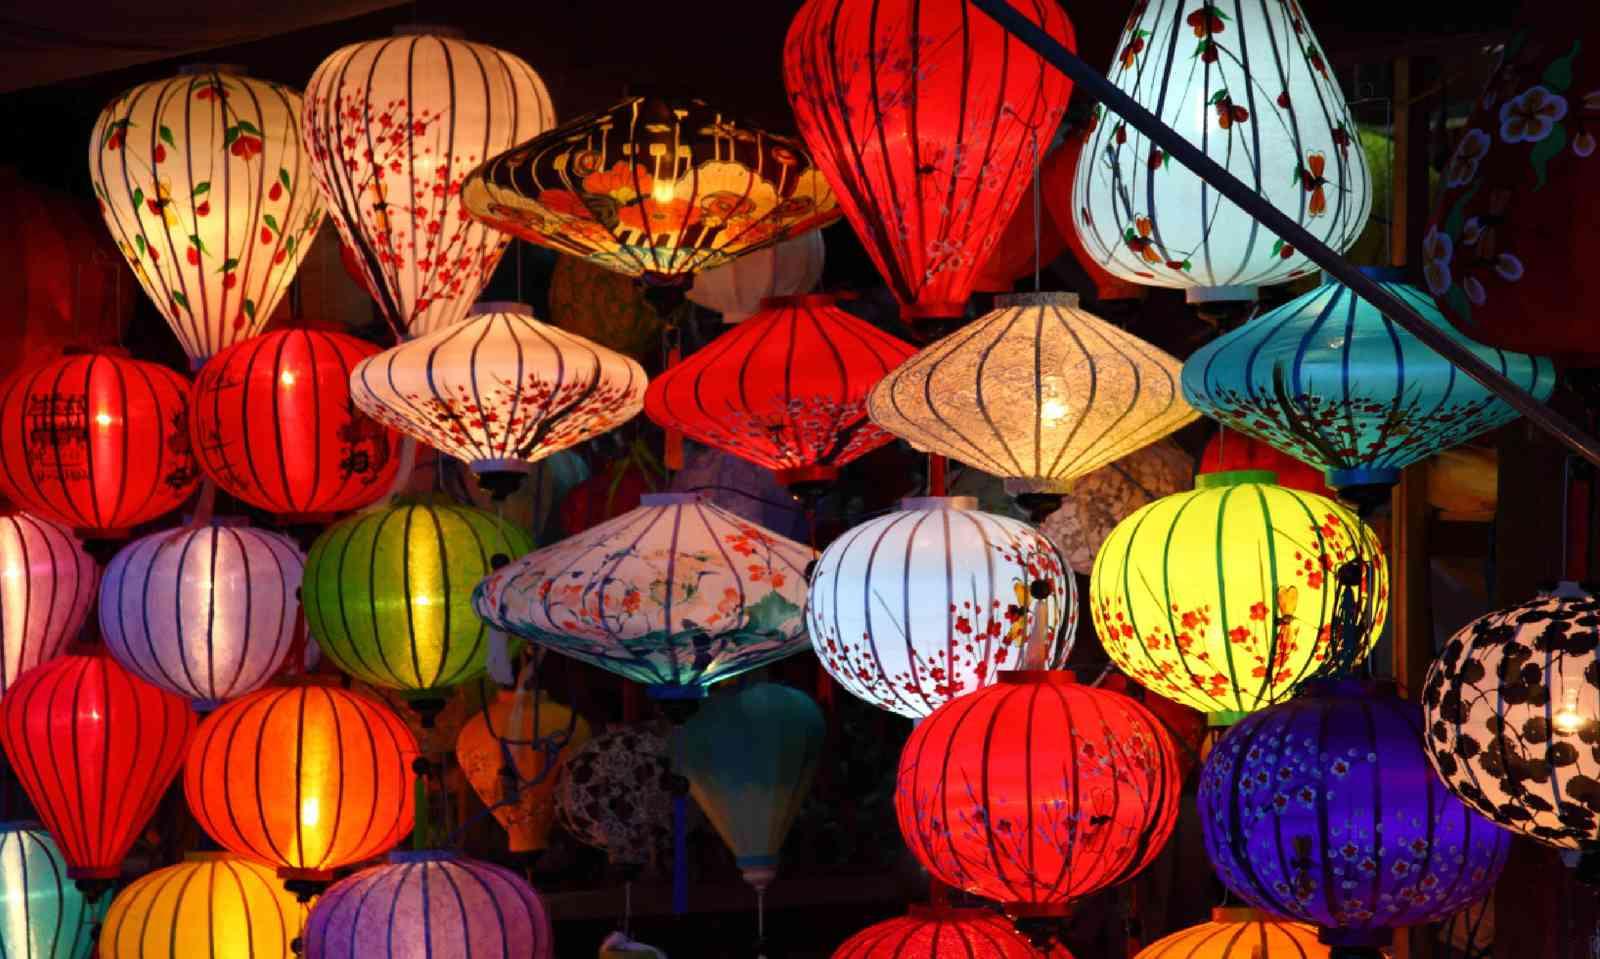 Lanterns (Dreamstime)